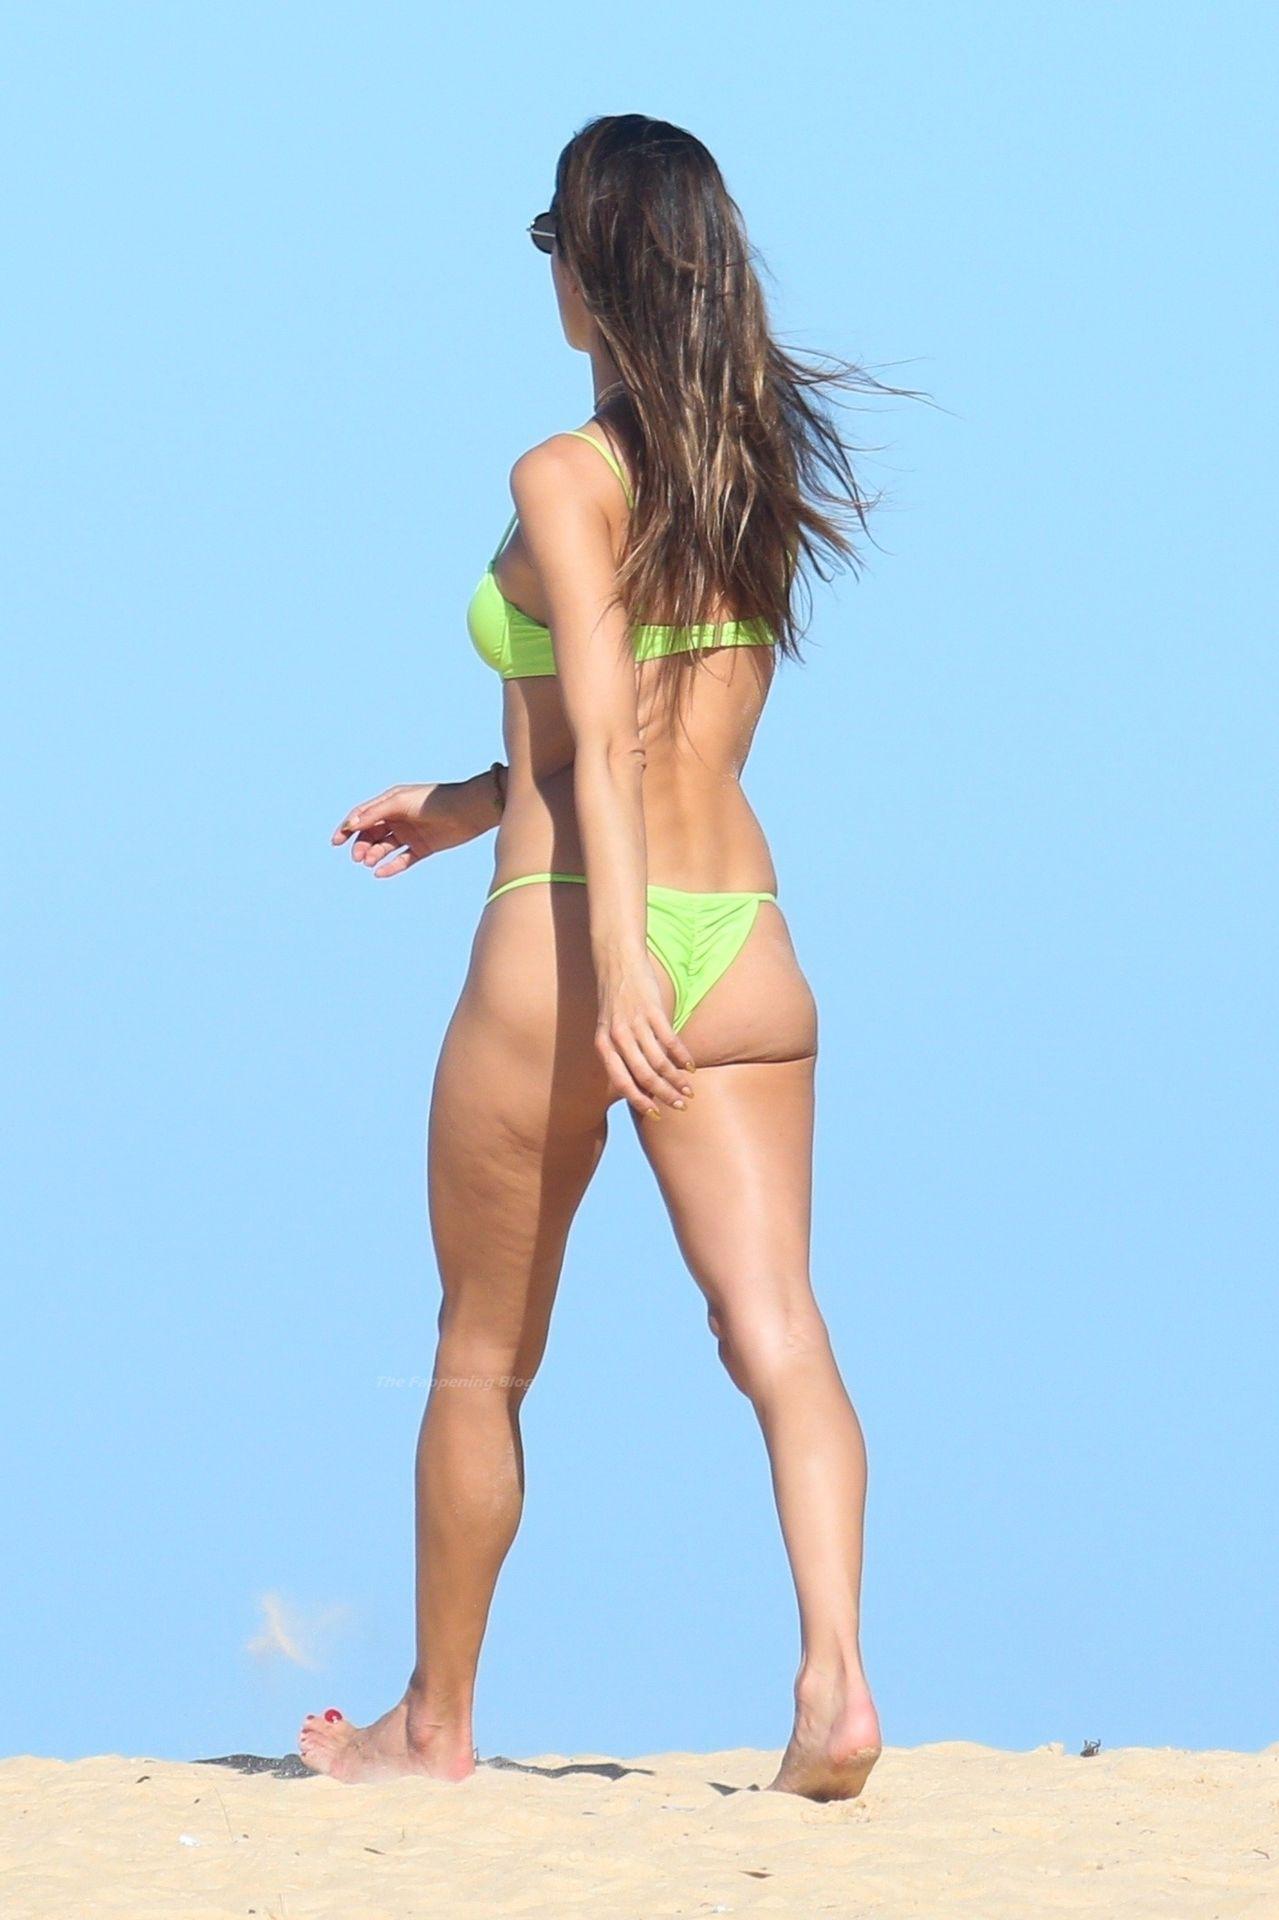 Alessandra-Ambrosio-Sexy-The-Fappening-Blog-931.jpg